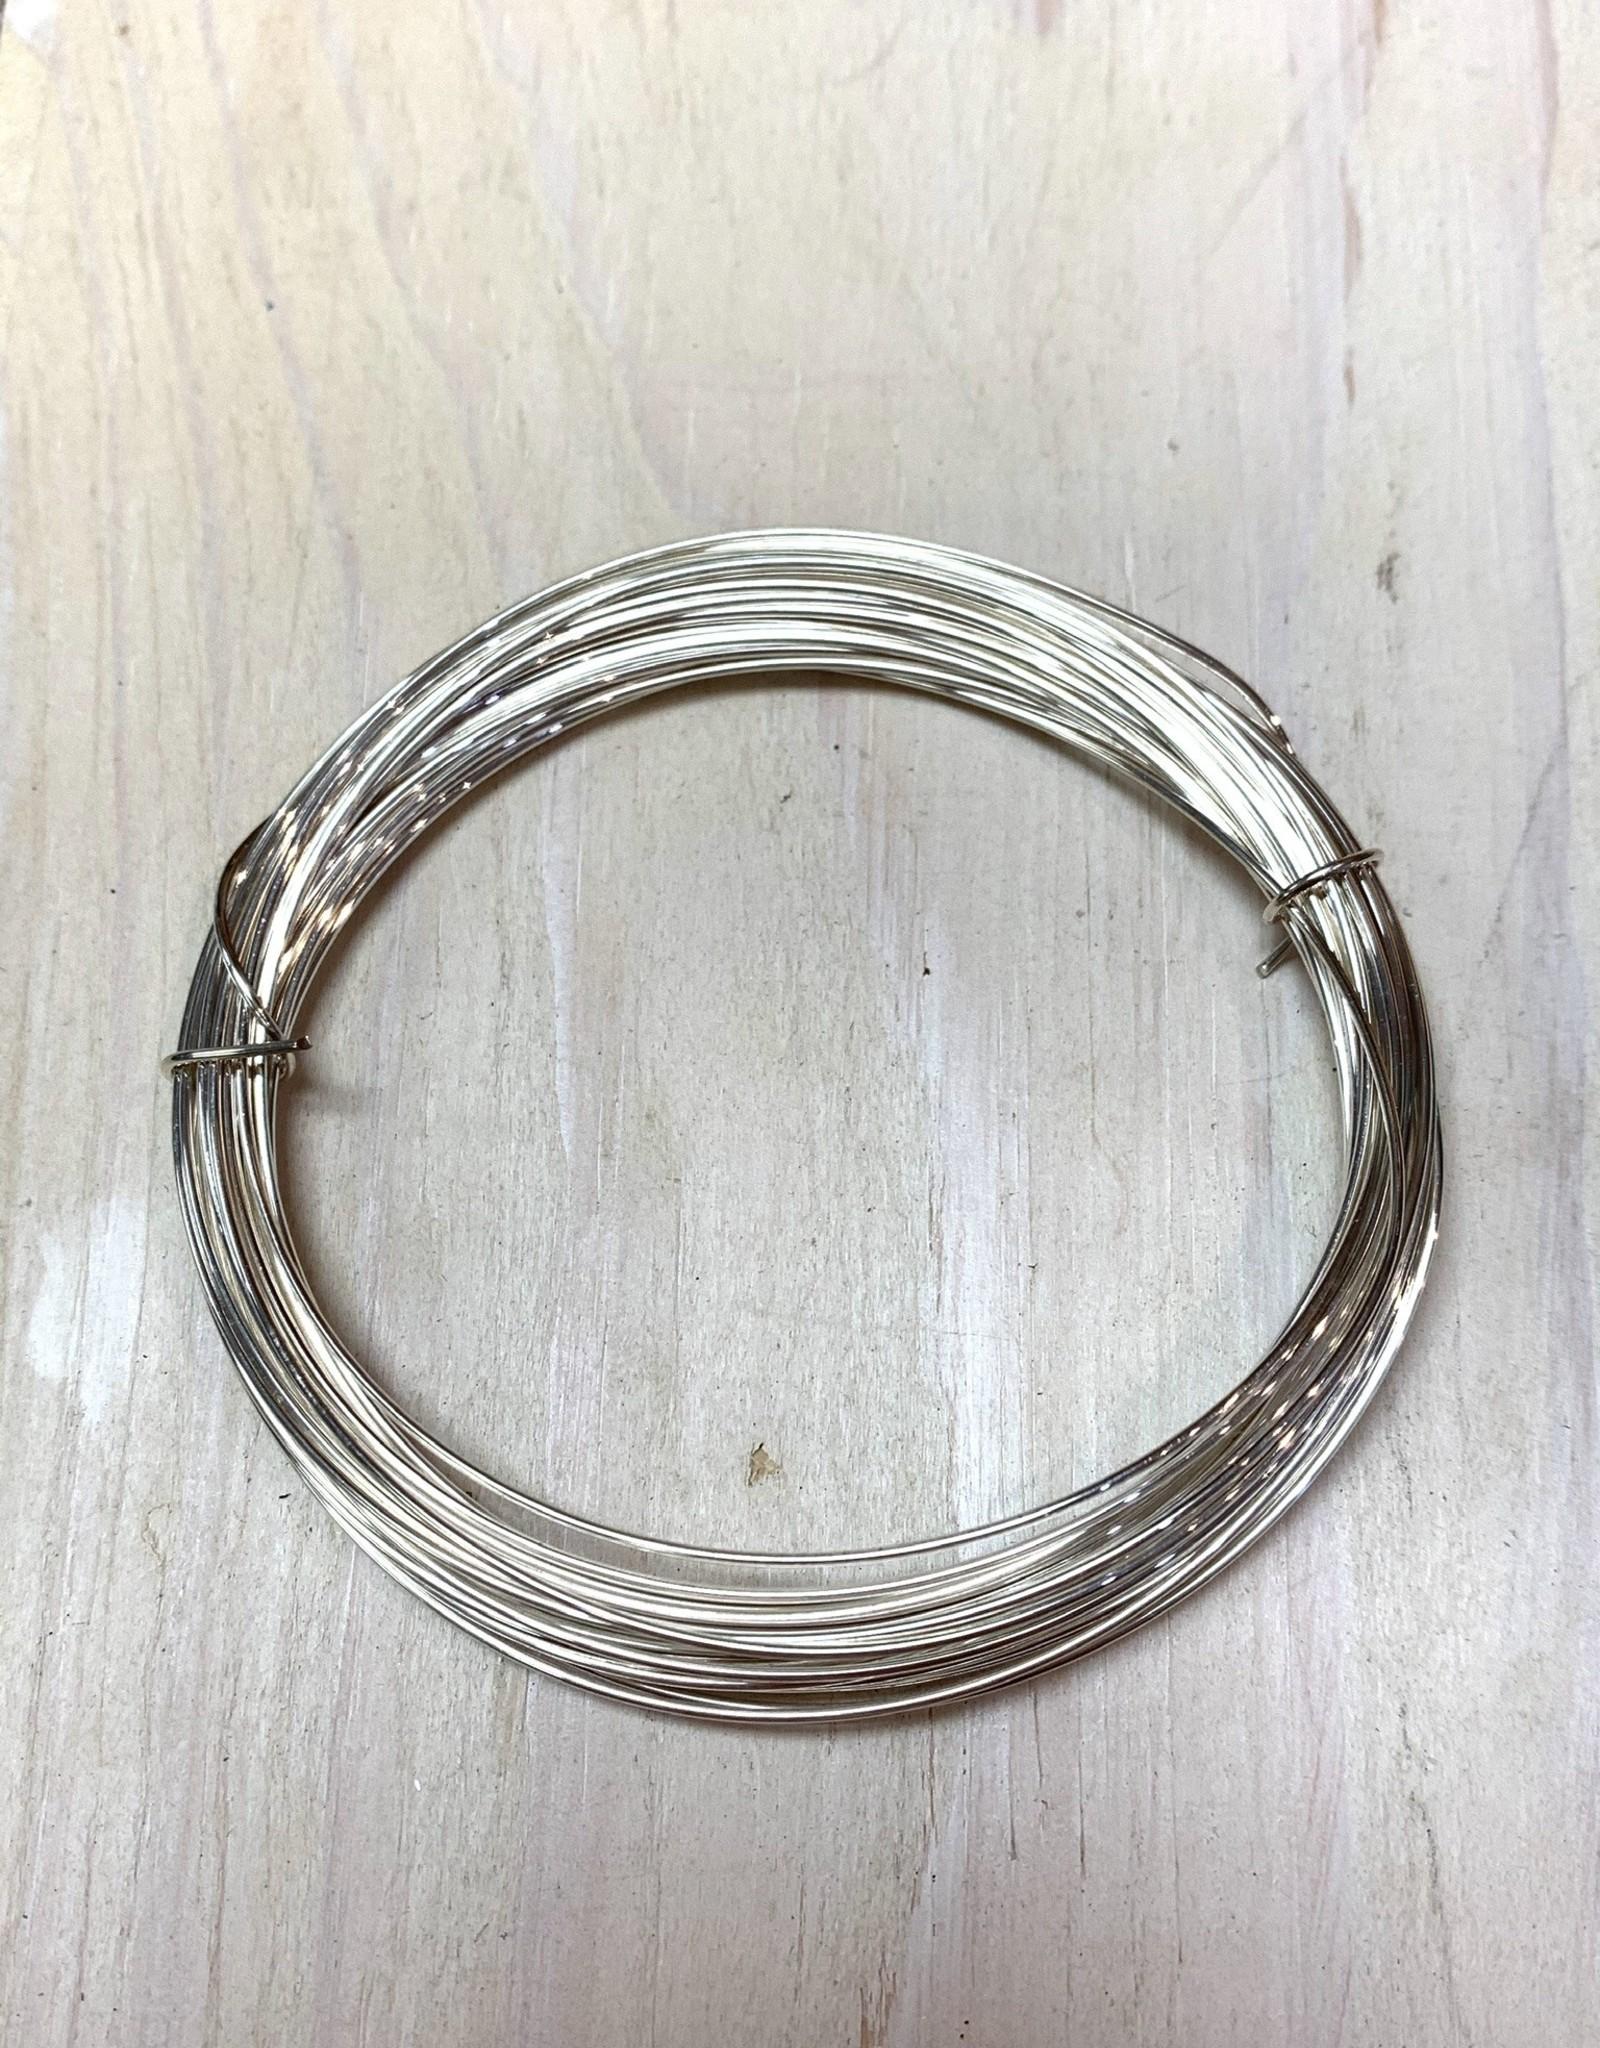 20ga Round Wire Sterling Silver 1oz HH